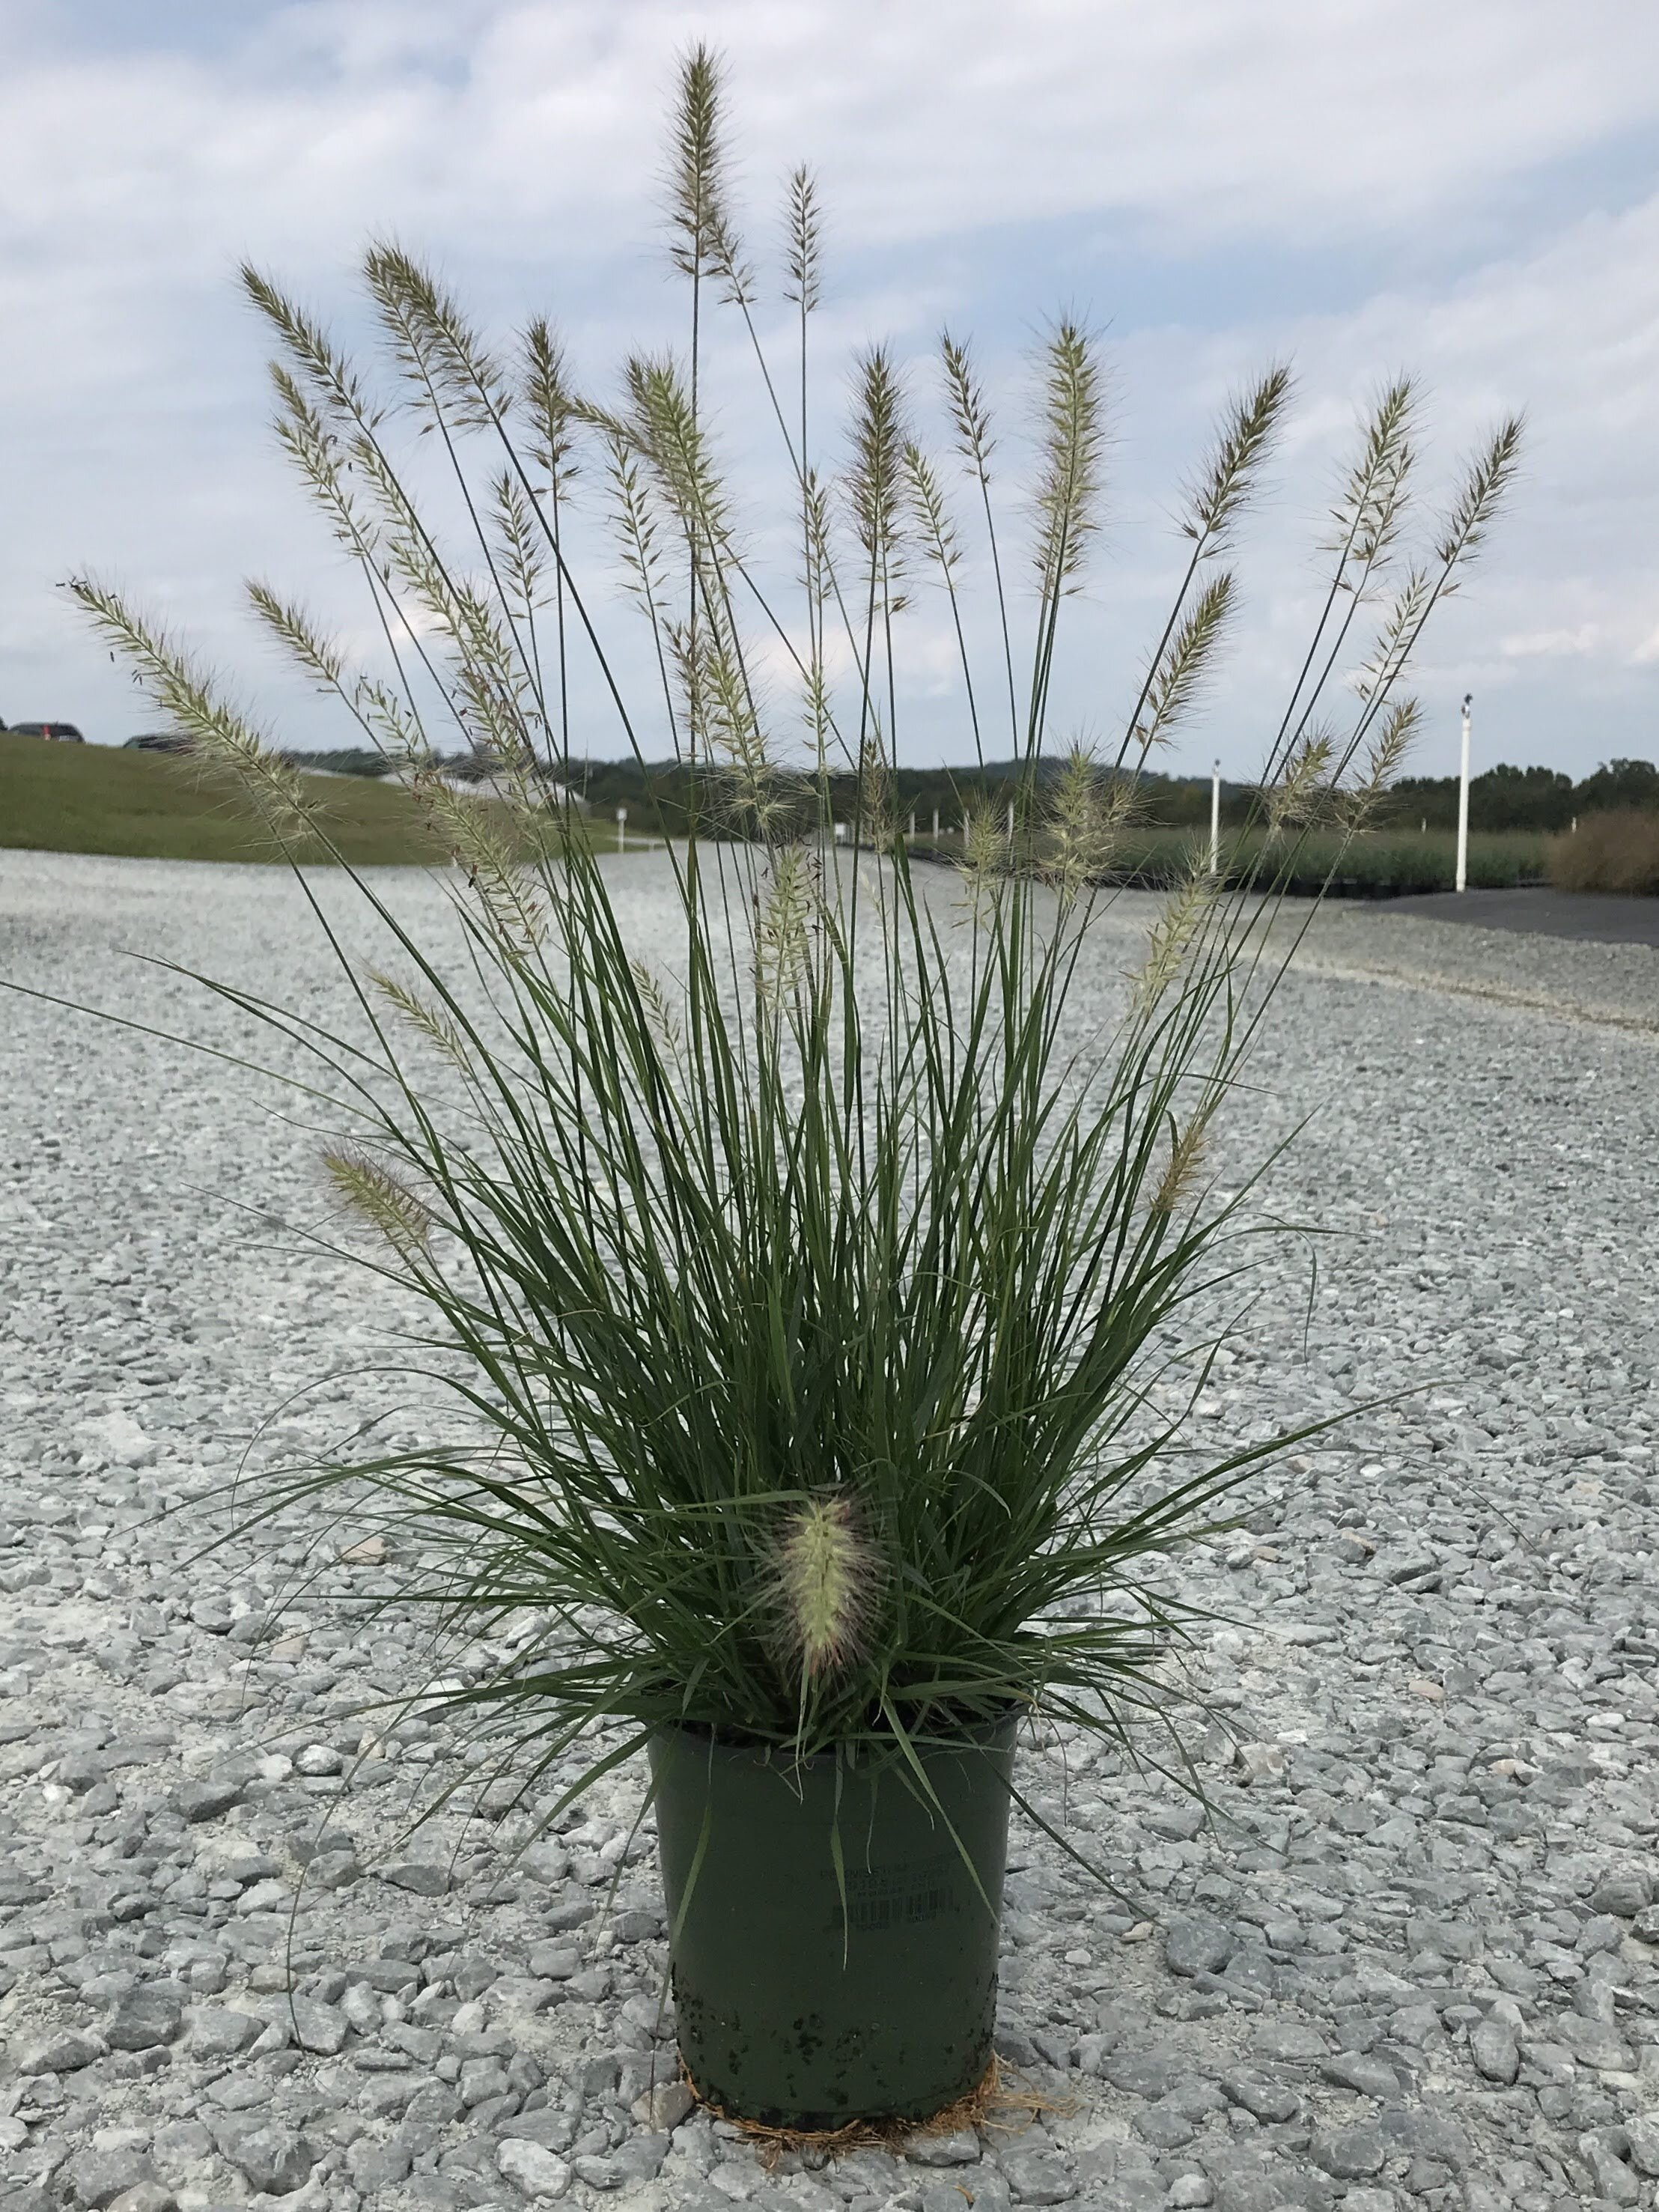 Pennisetum alopecuroides 'Cassian' 1 gallon